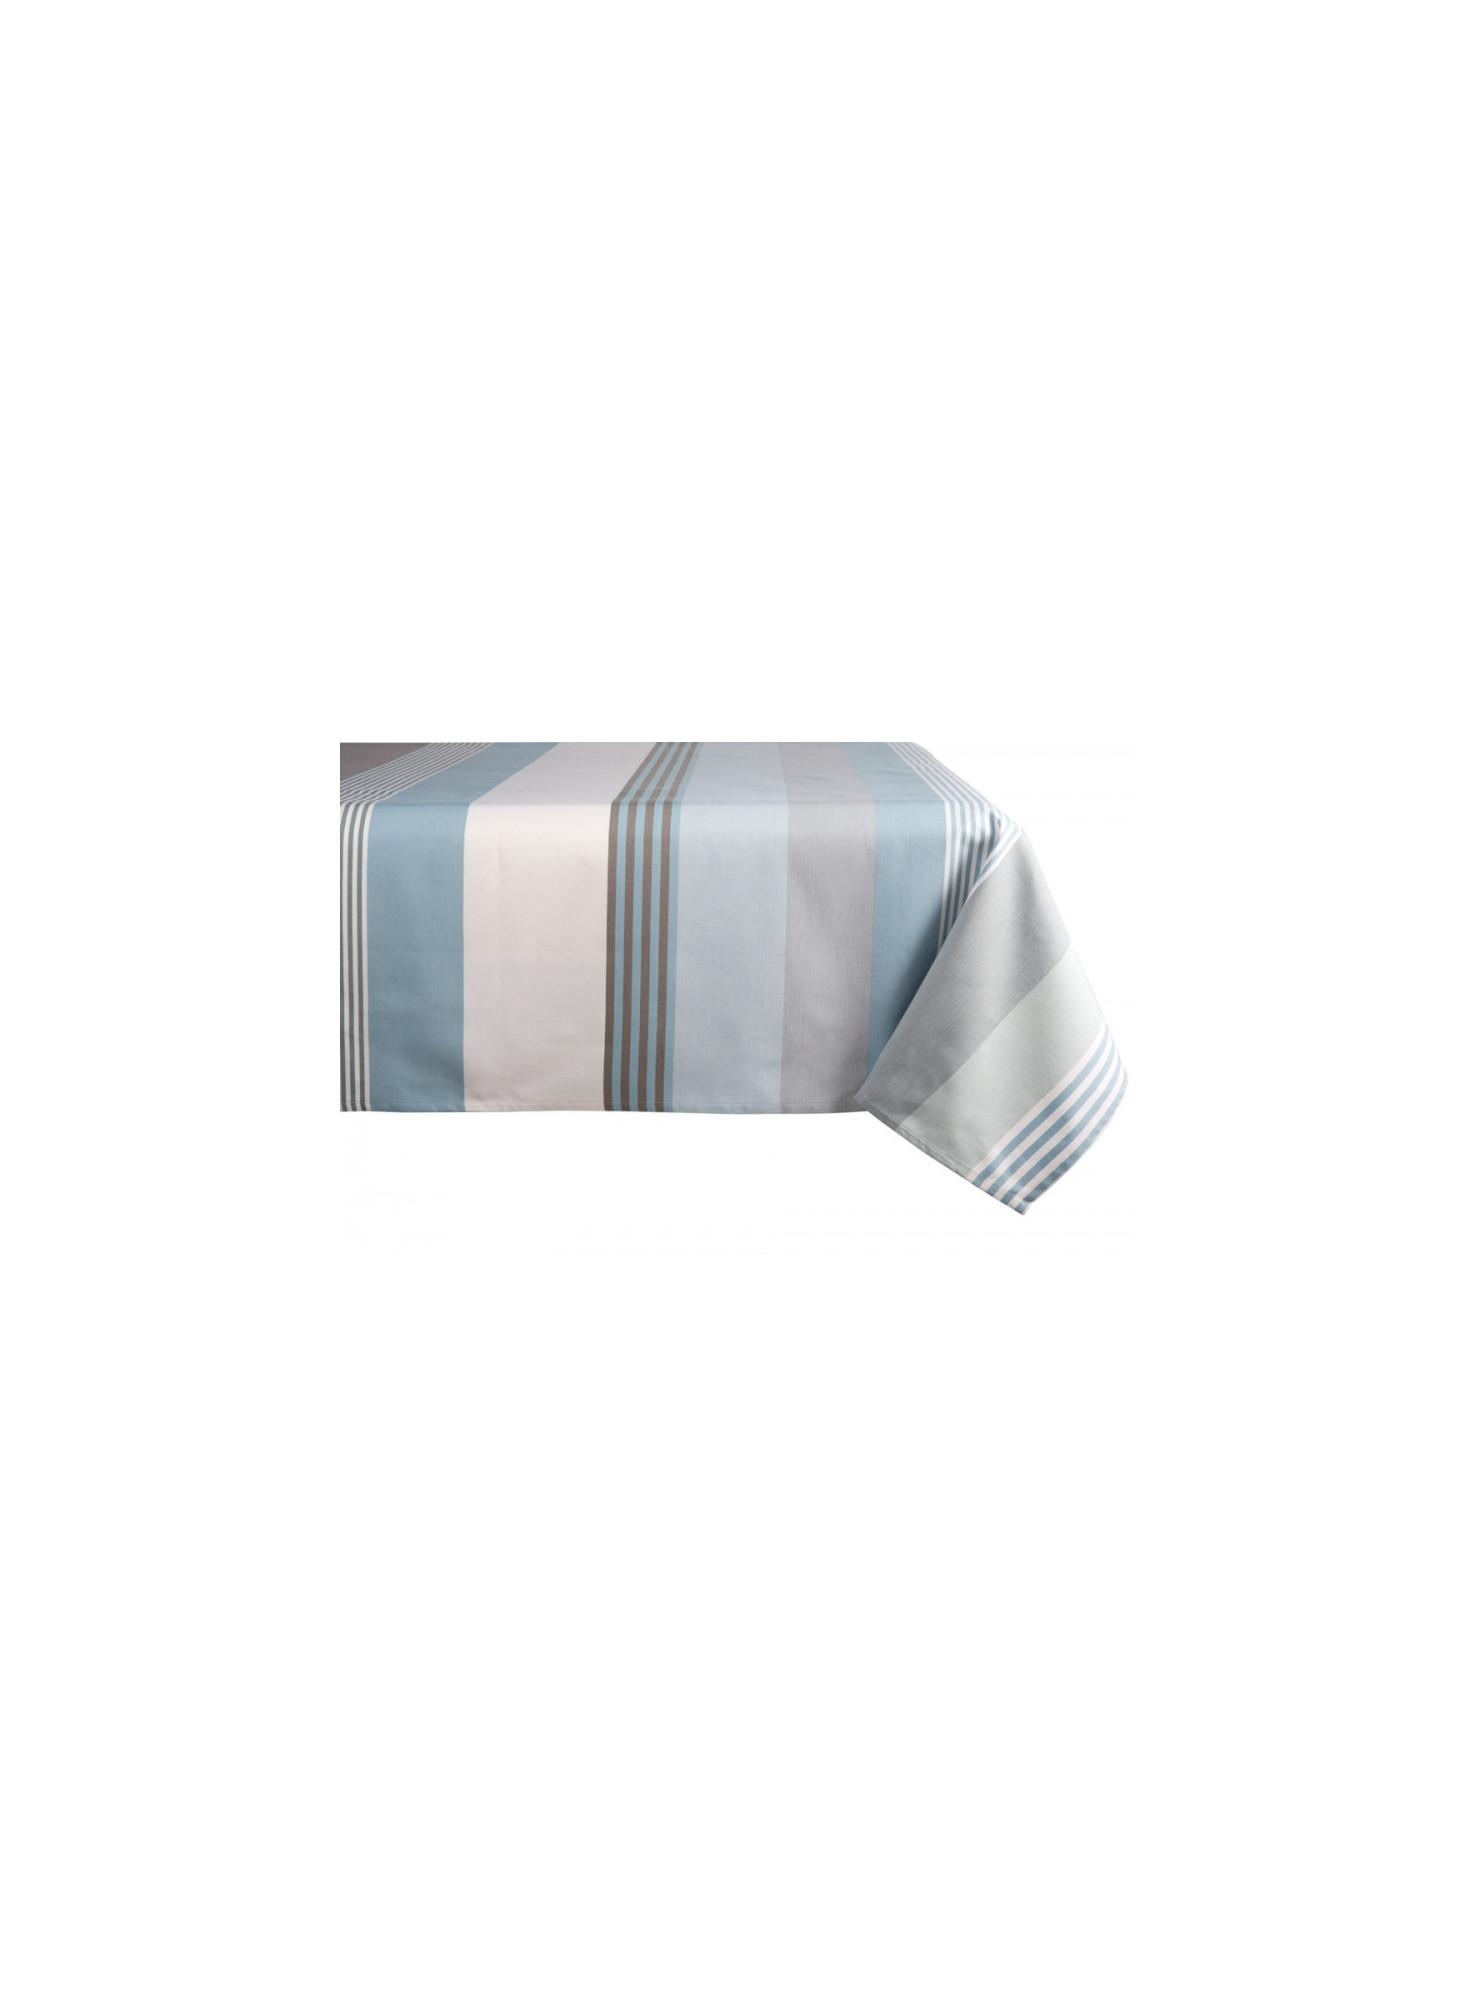 Cotton tablecloth Belle-île en Mer- tableware basque linen